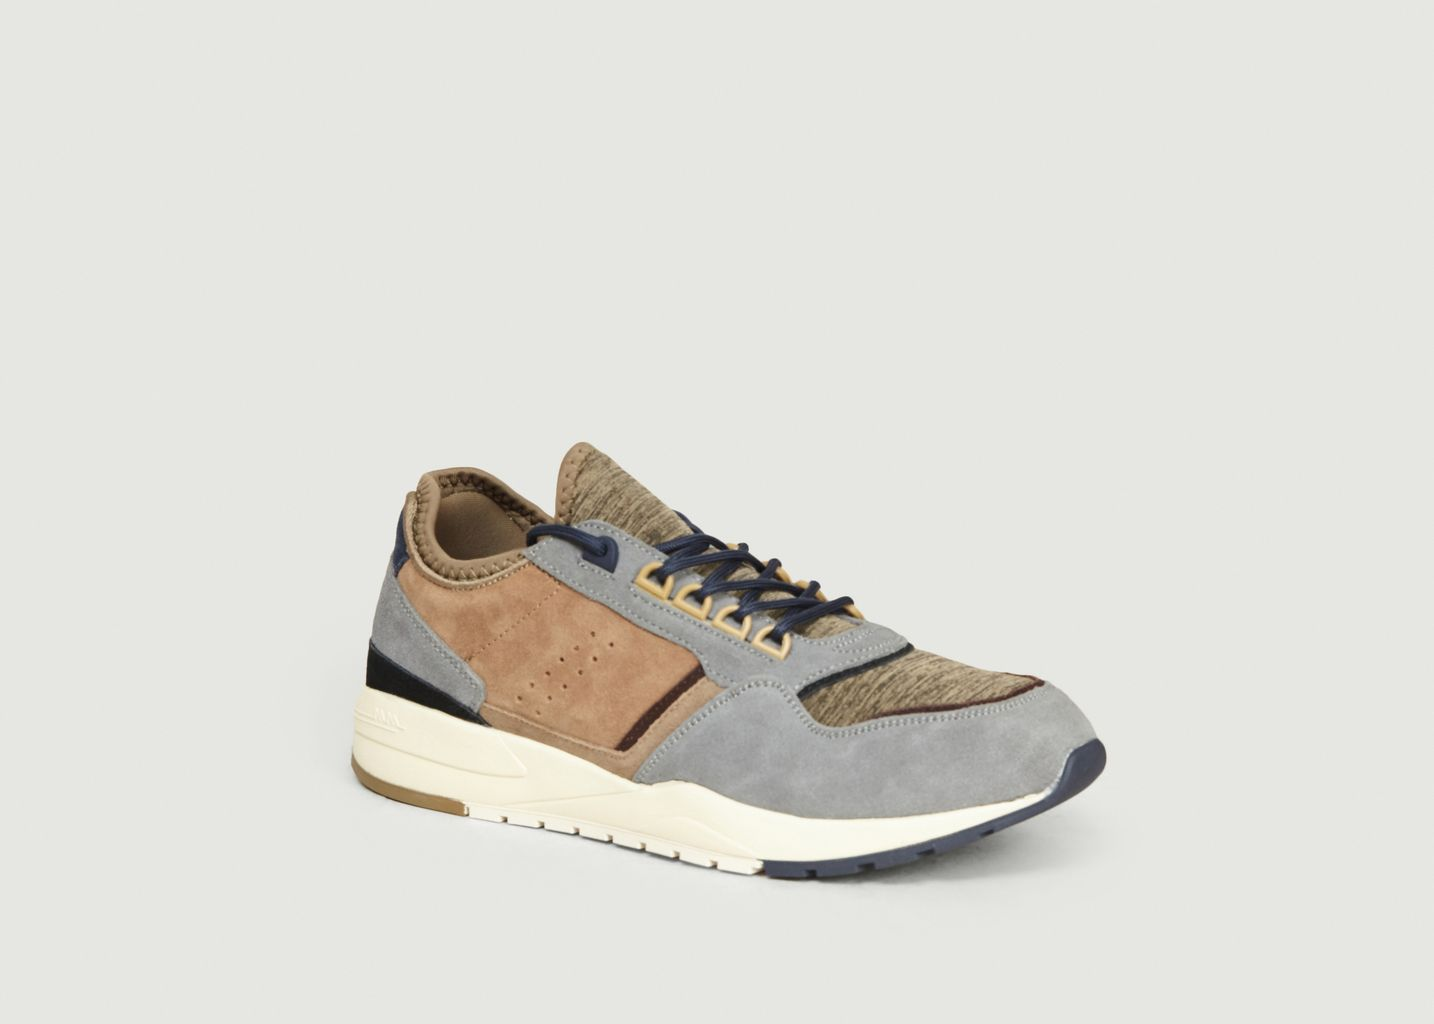 Sneakers De Running Basile - M. Moustache